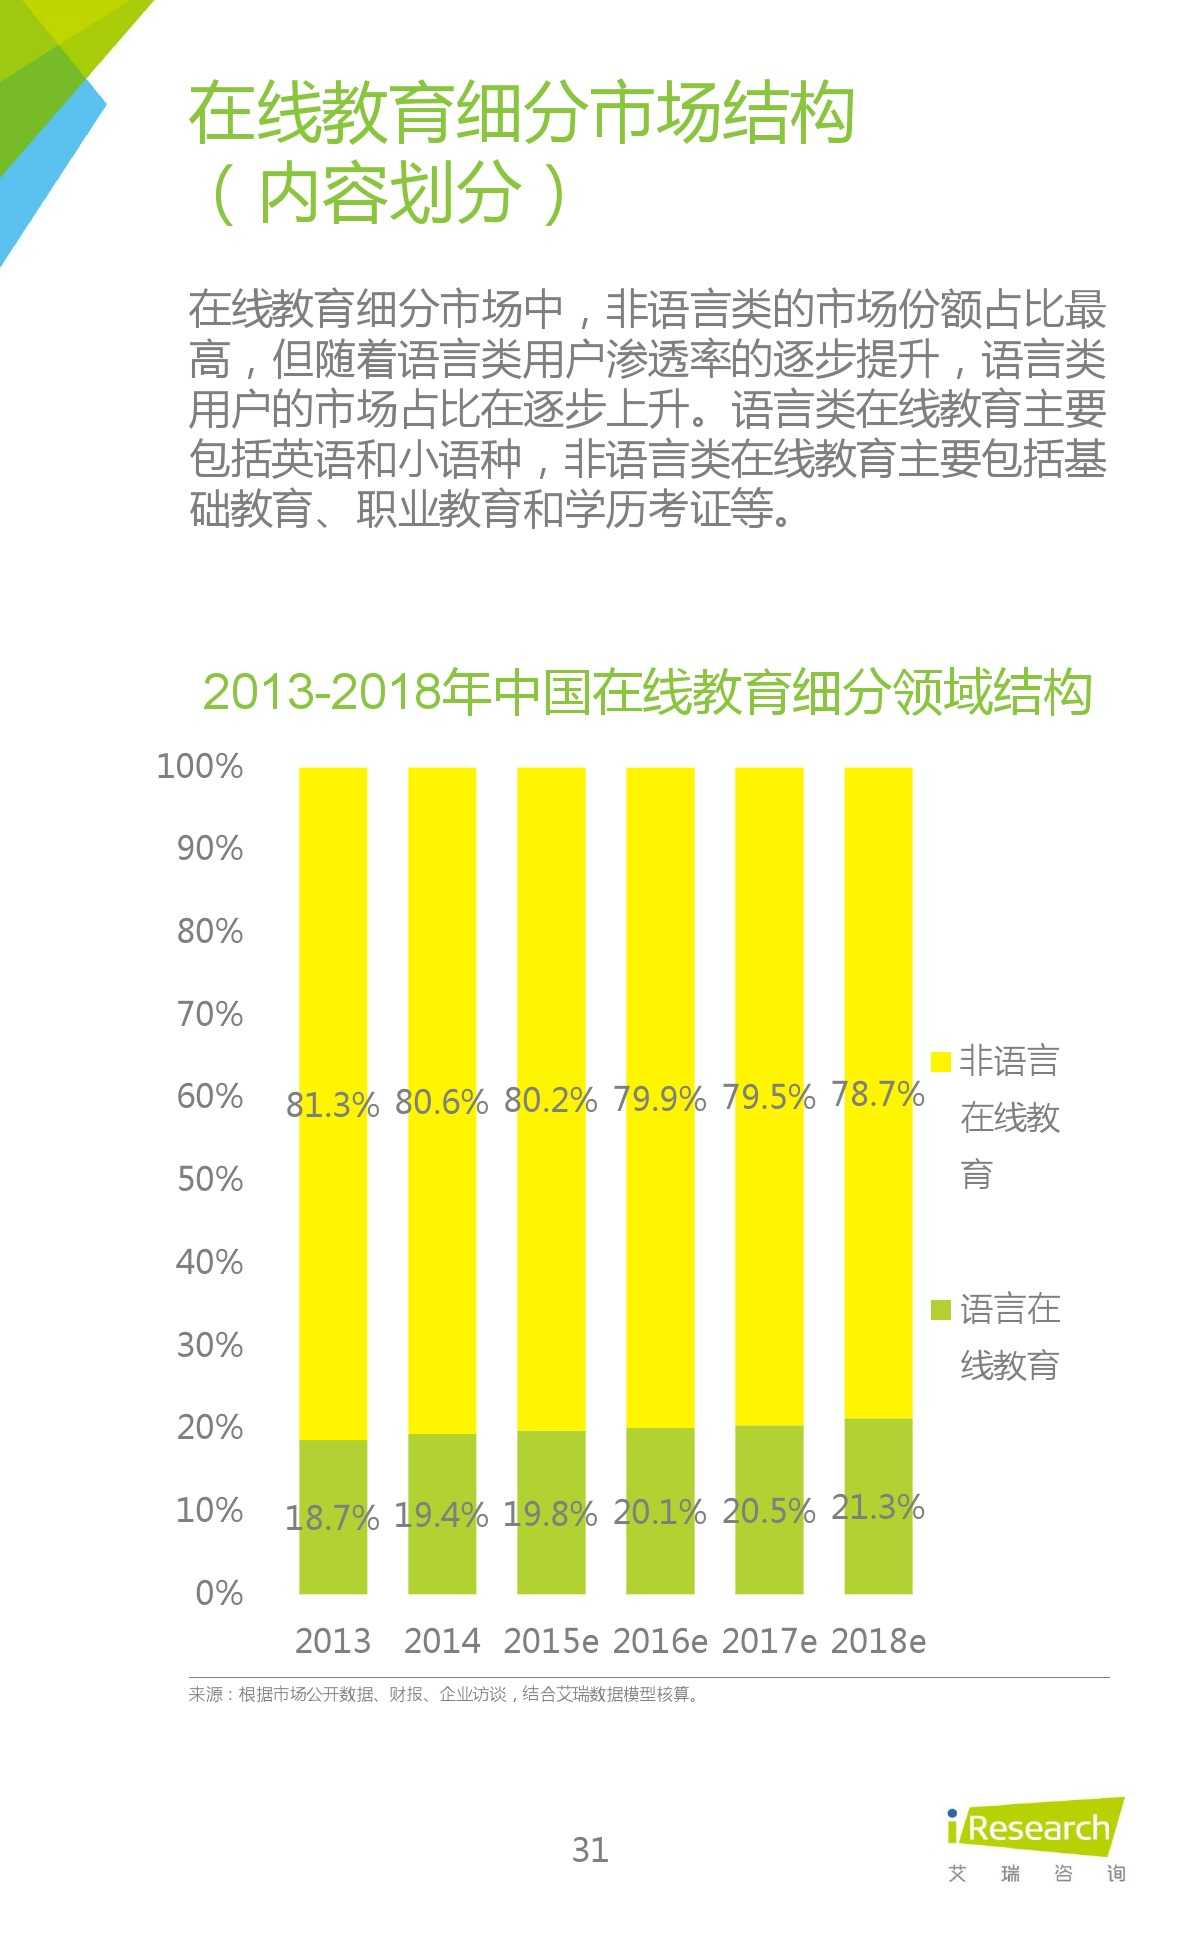 iResearch-2015年中国在线教育平台研究报告_000031